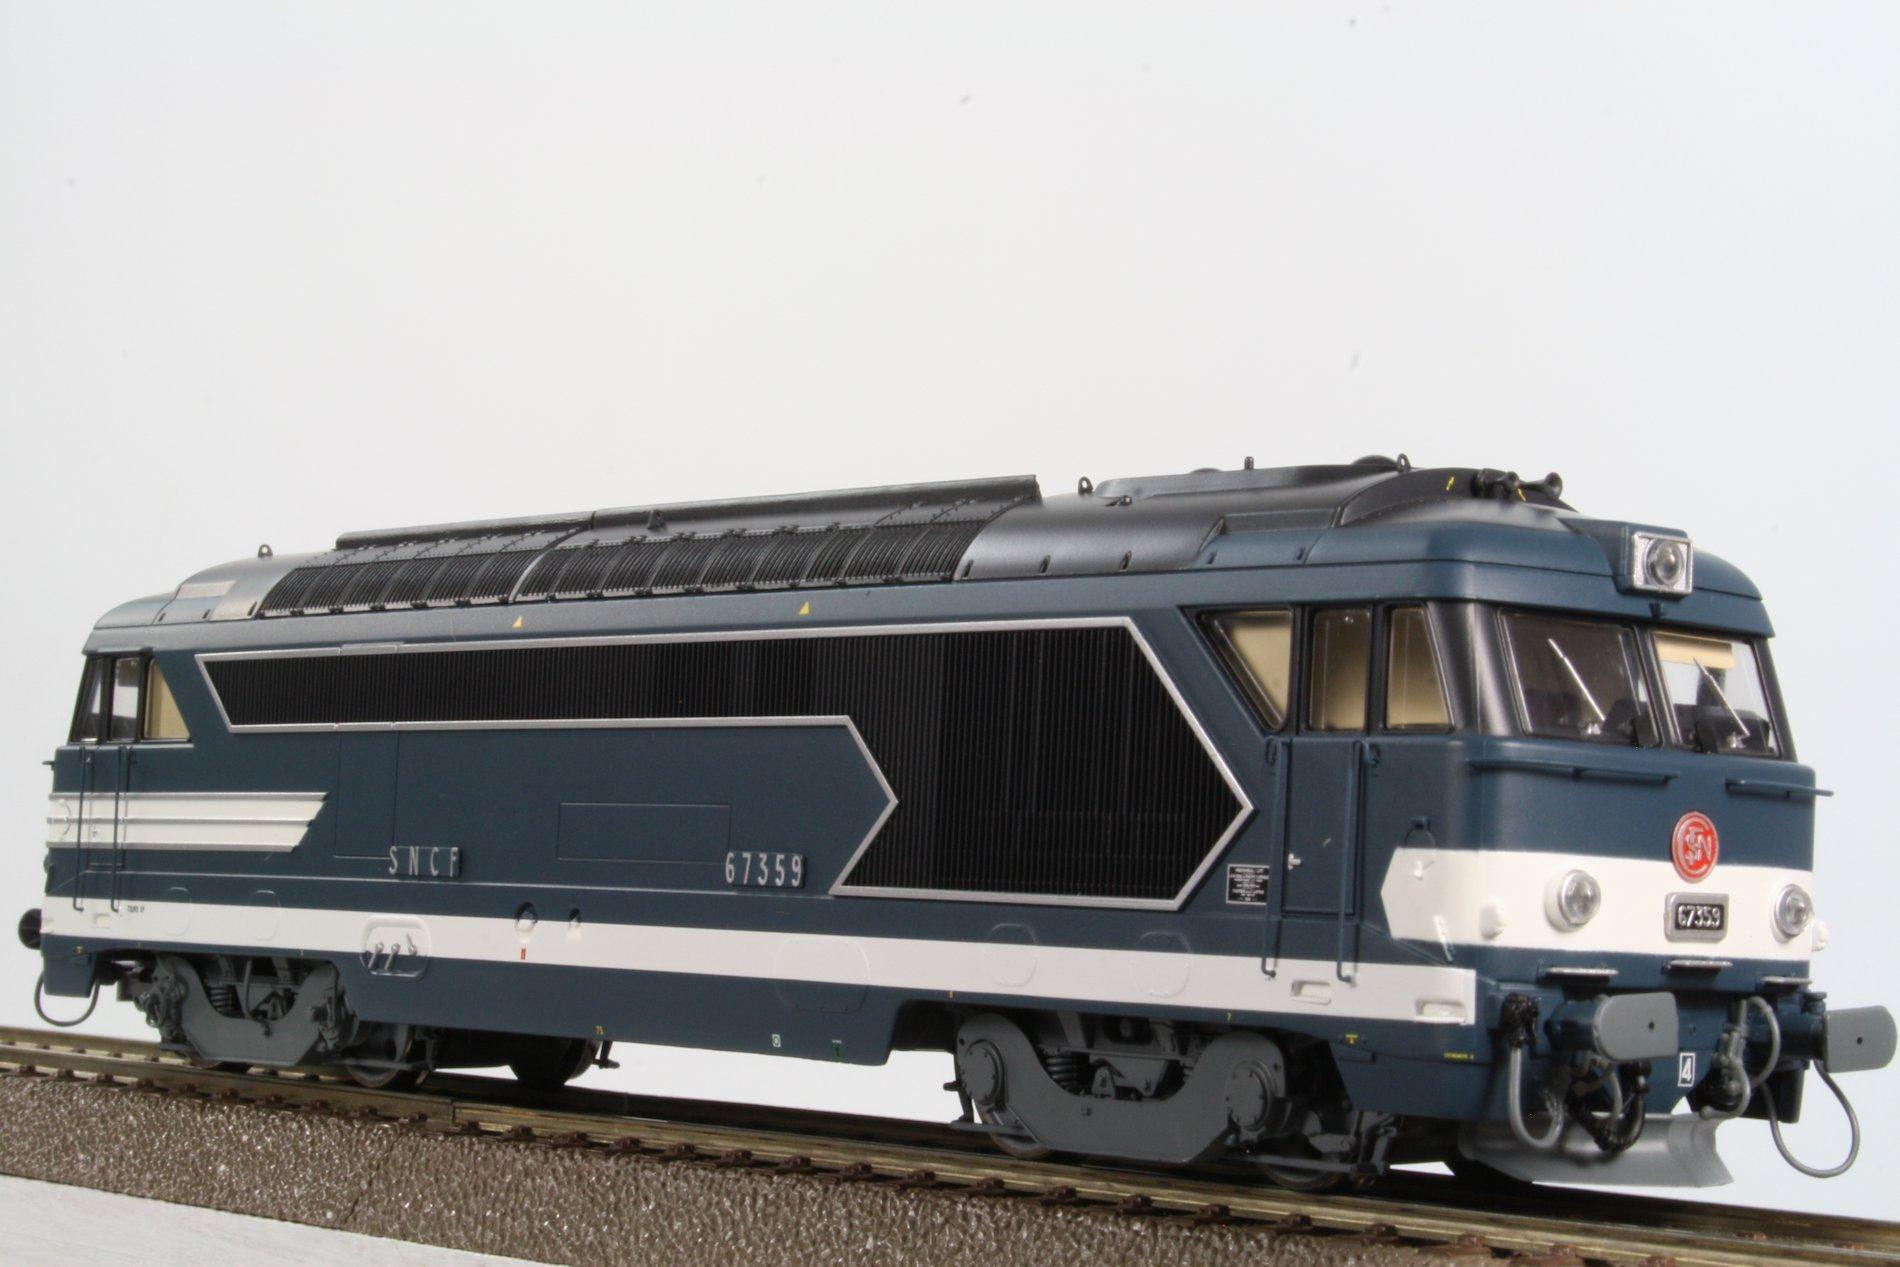 locomotive di sel bb67359 d p t de tours origine digital sound ree modeles ree mb025s. Black Bedroom Furniture Sets. Home Design Ideas